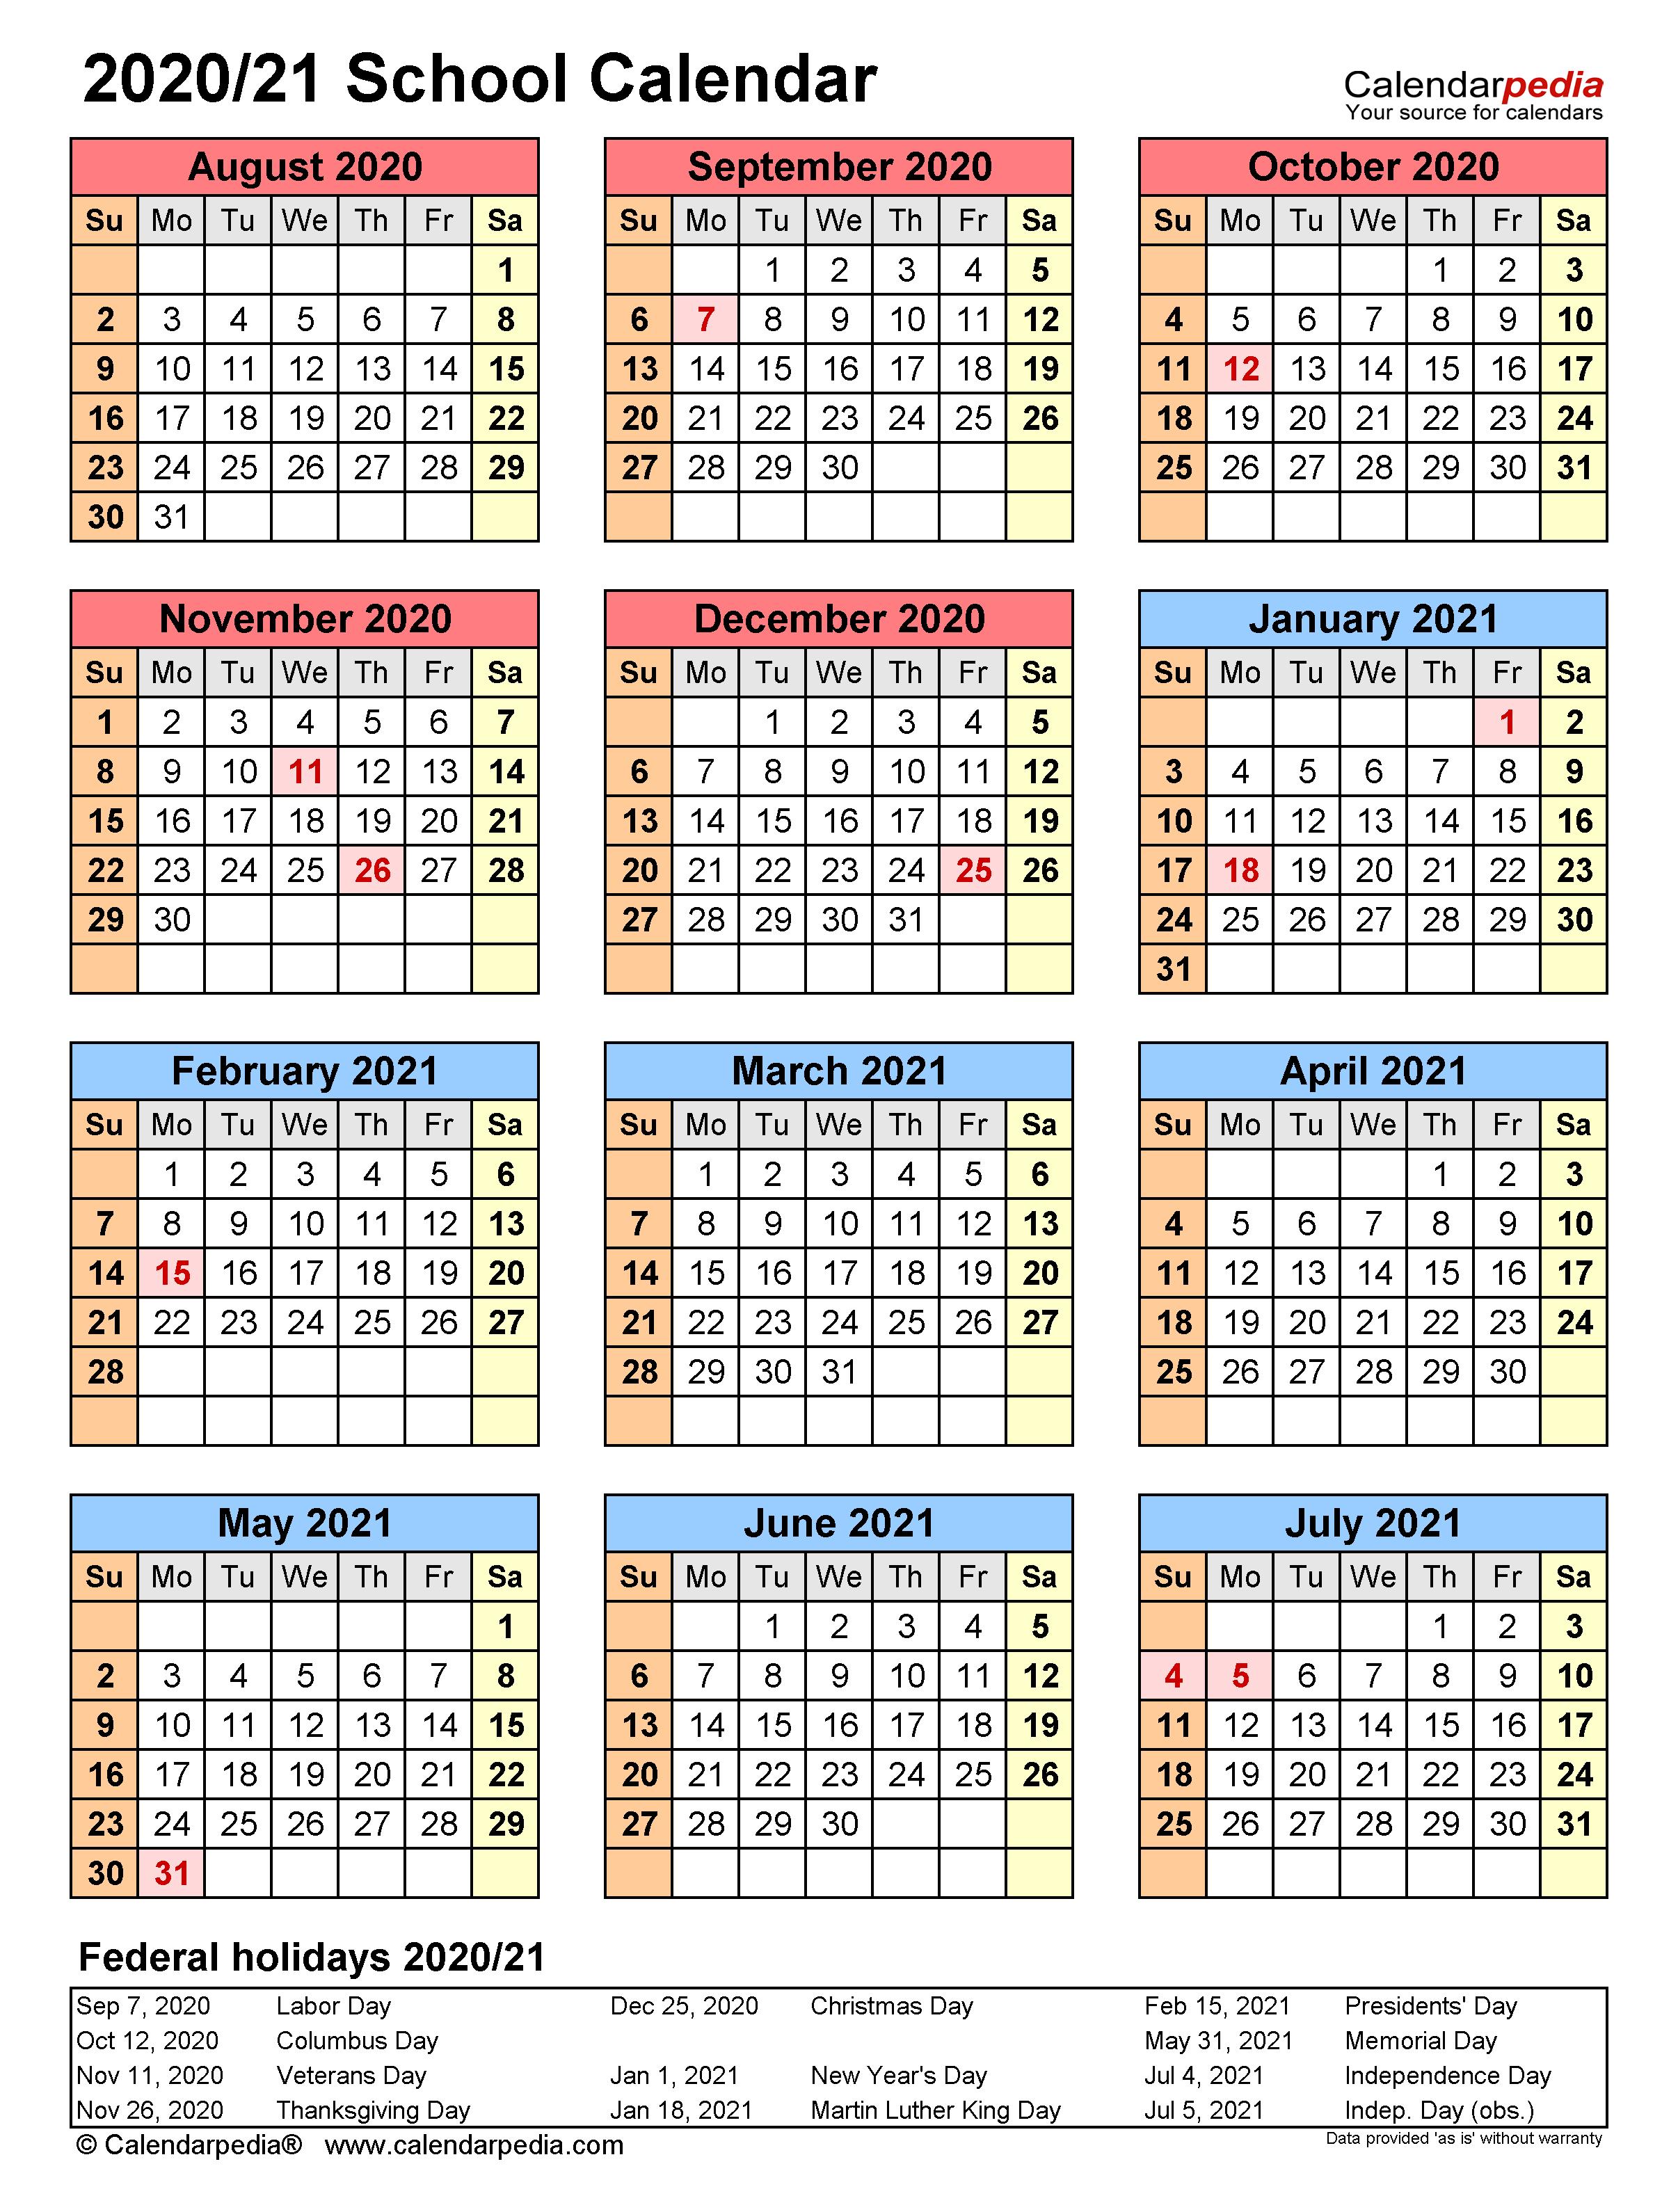 School Calendars 2020/2021 - Free Printable Word Templates With Regard To Columbus State Calendar 2021 20